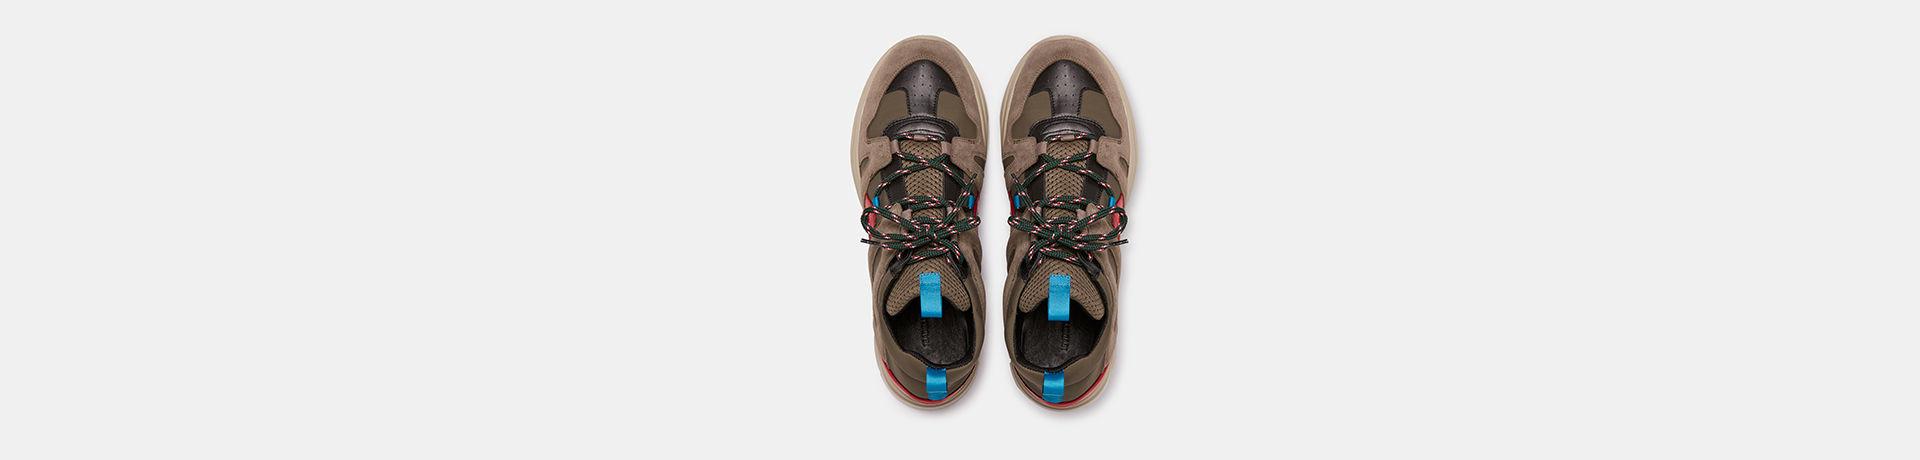 KINDSAY H 运动鞋